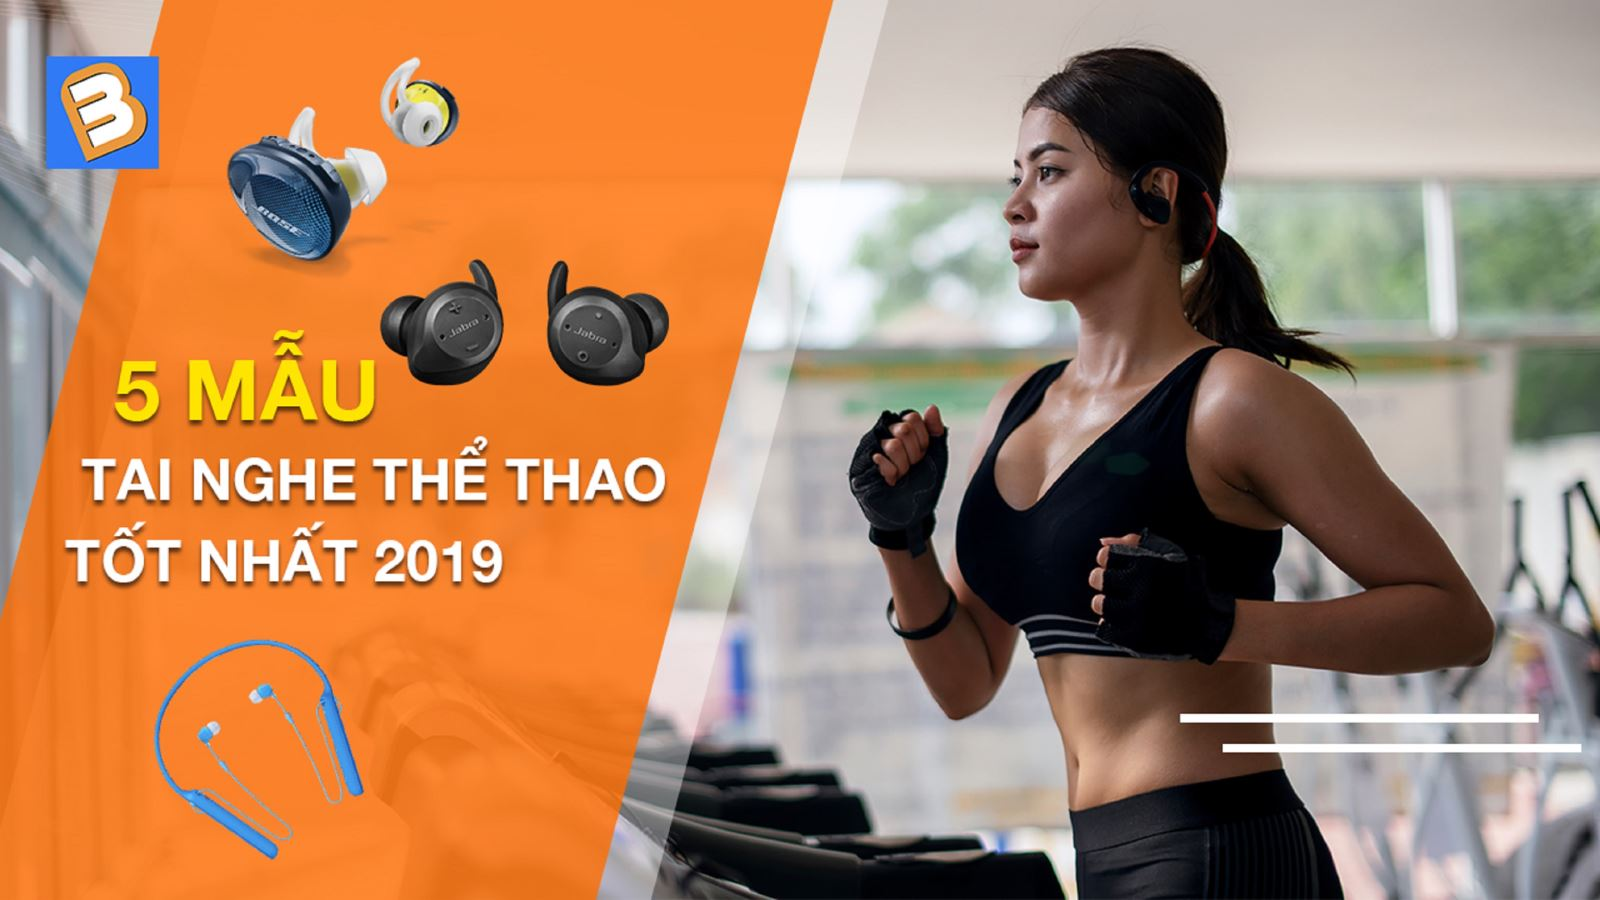 5mẫu tai nghe thể thao tốt nhất 2019